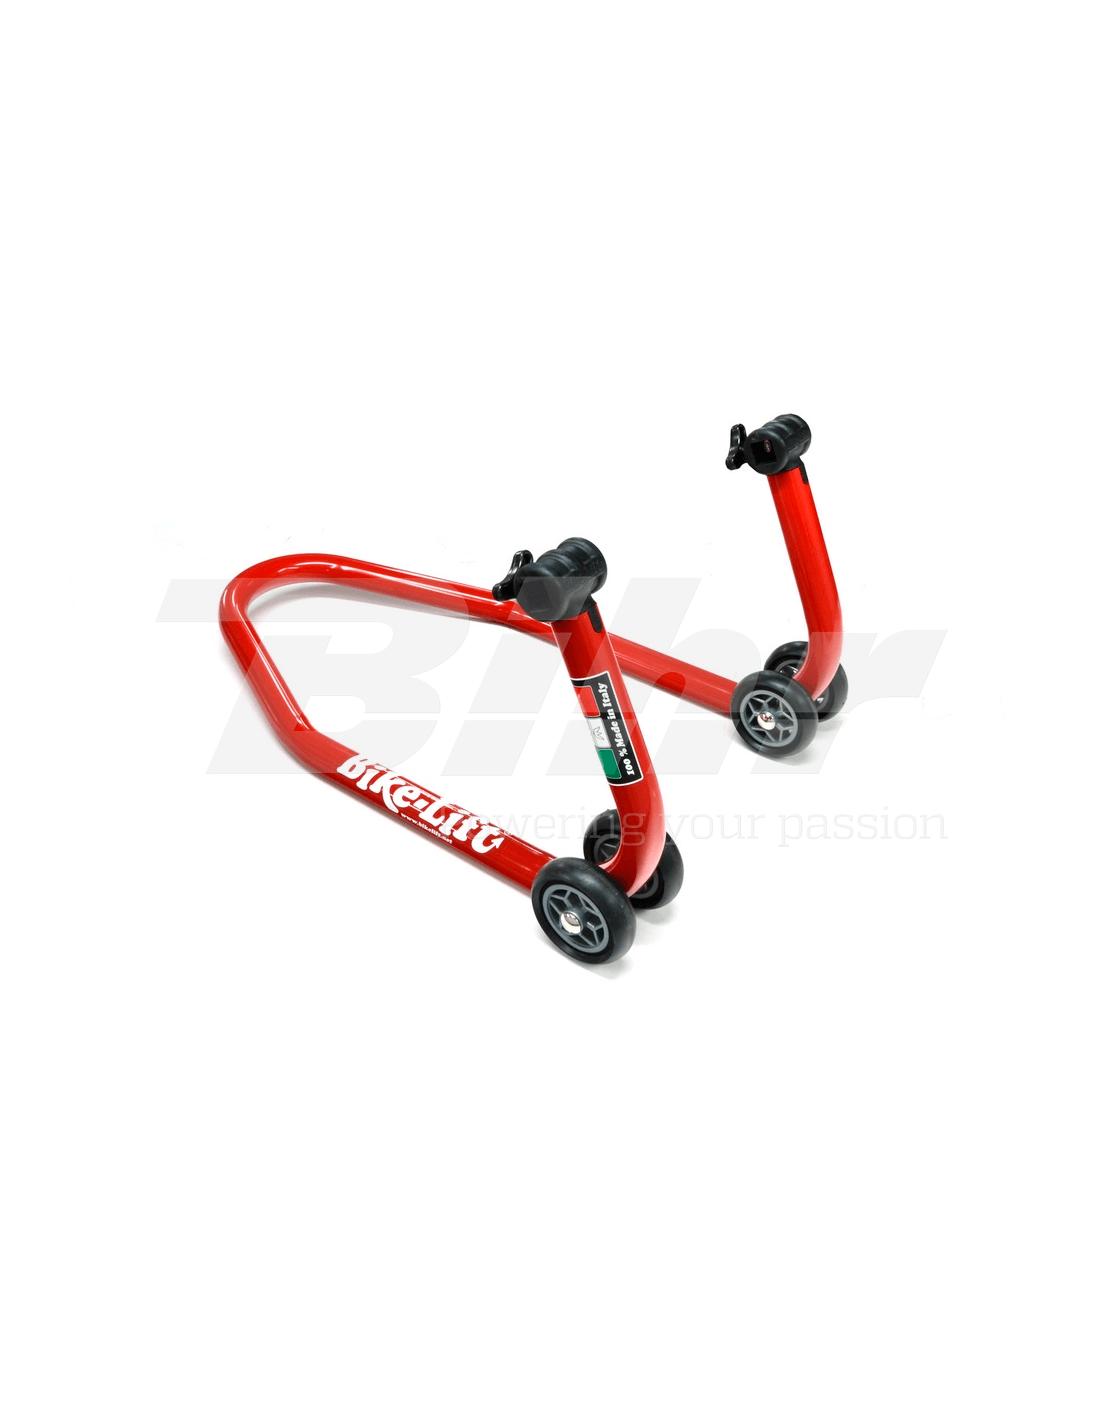 Stand delantero a la horquilla Bike-Lift FS-10 aa9f17a117ee